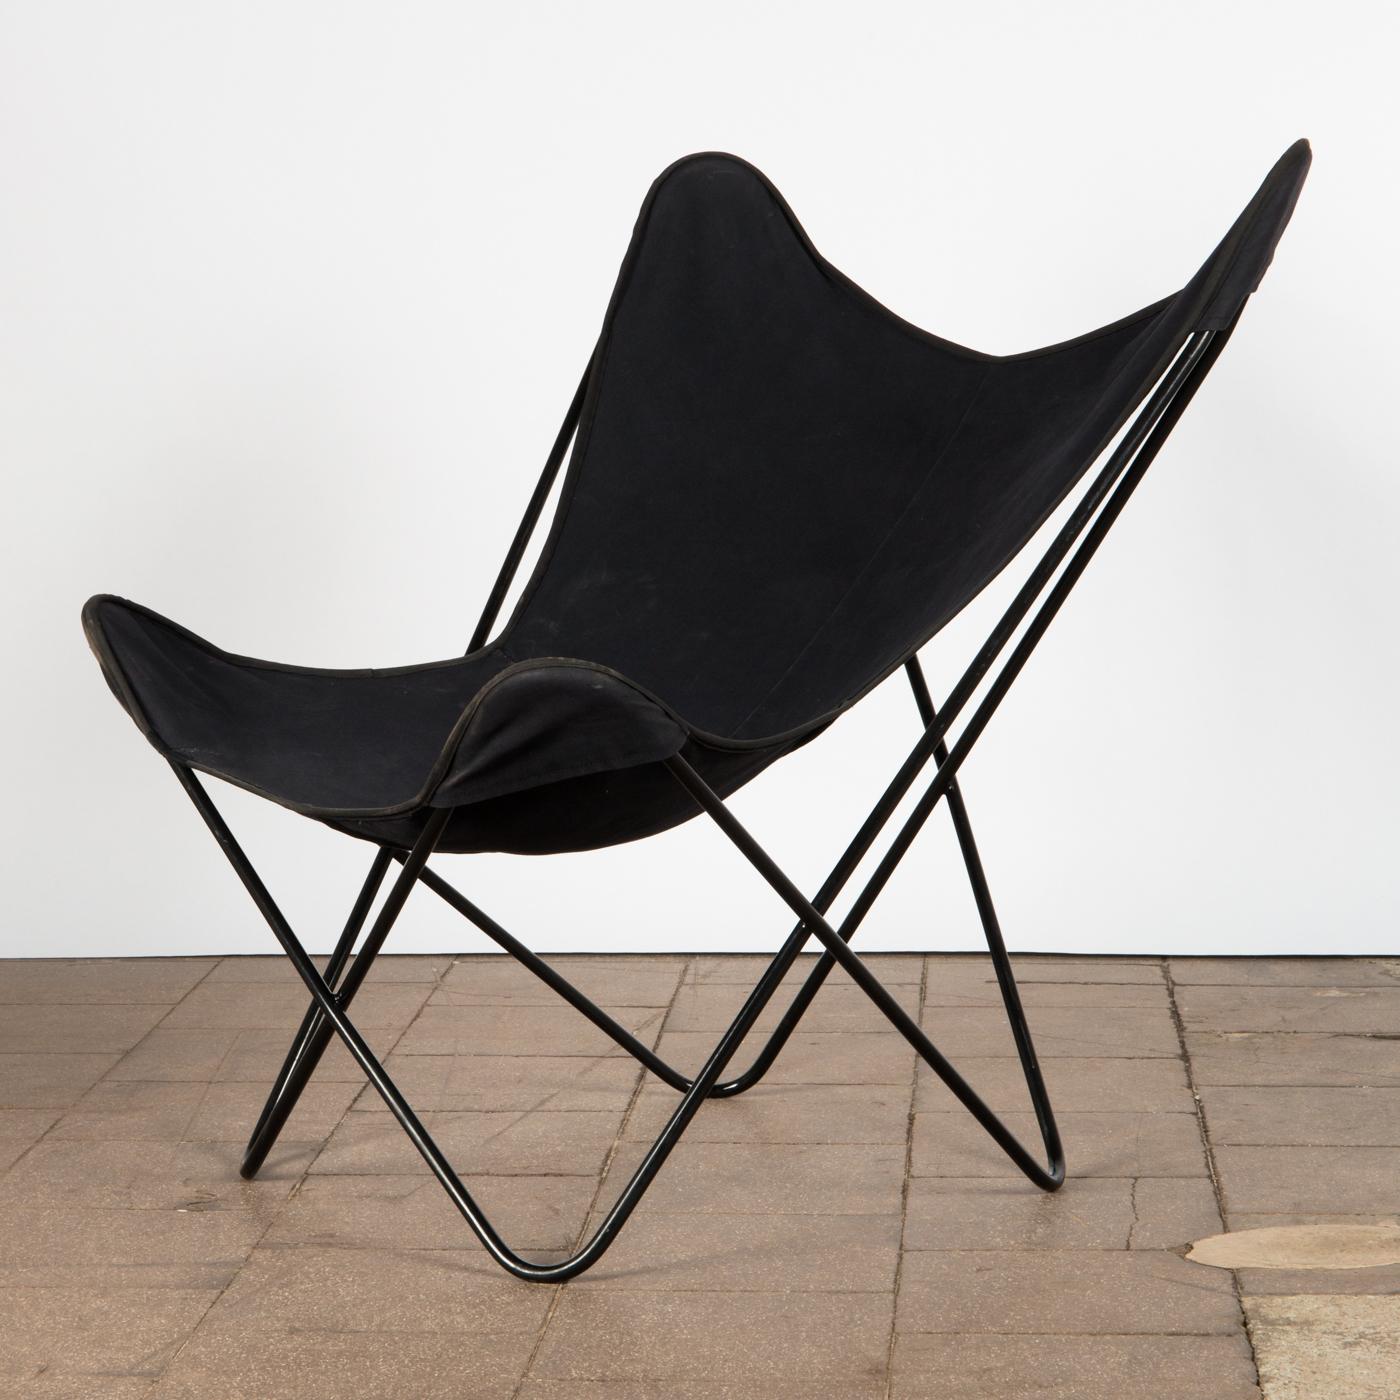 Jorge Ferrari Hardoy, Juan Kurchan Und Antonio Bonet, Hardoy Chair / Lounge  Chair, Metall / Stoff   Lauritz.com